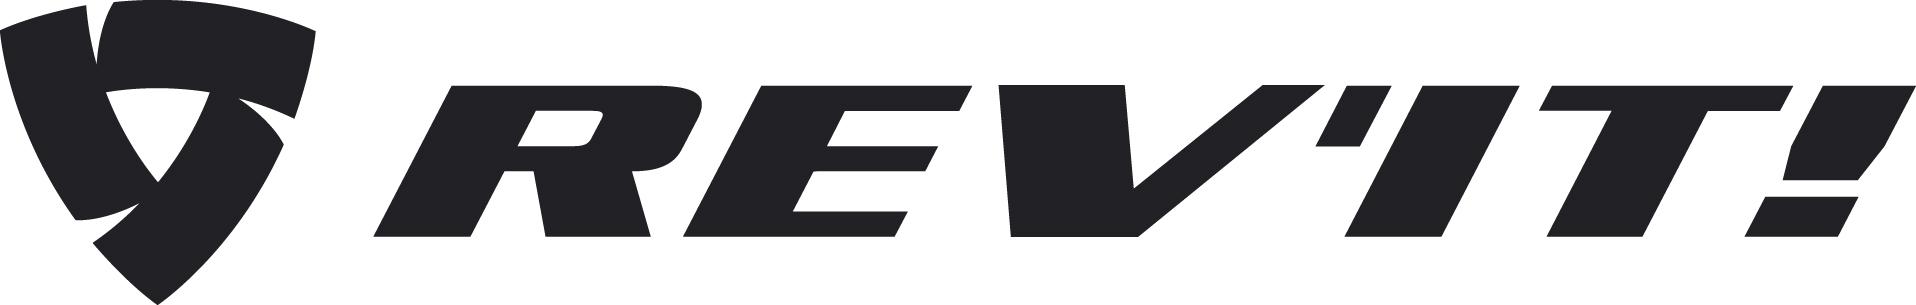 revit-logo-black.jpg